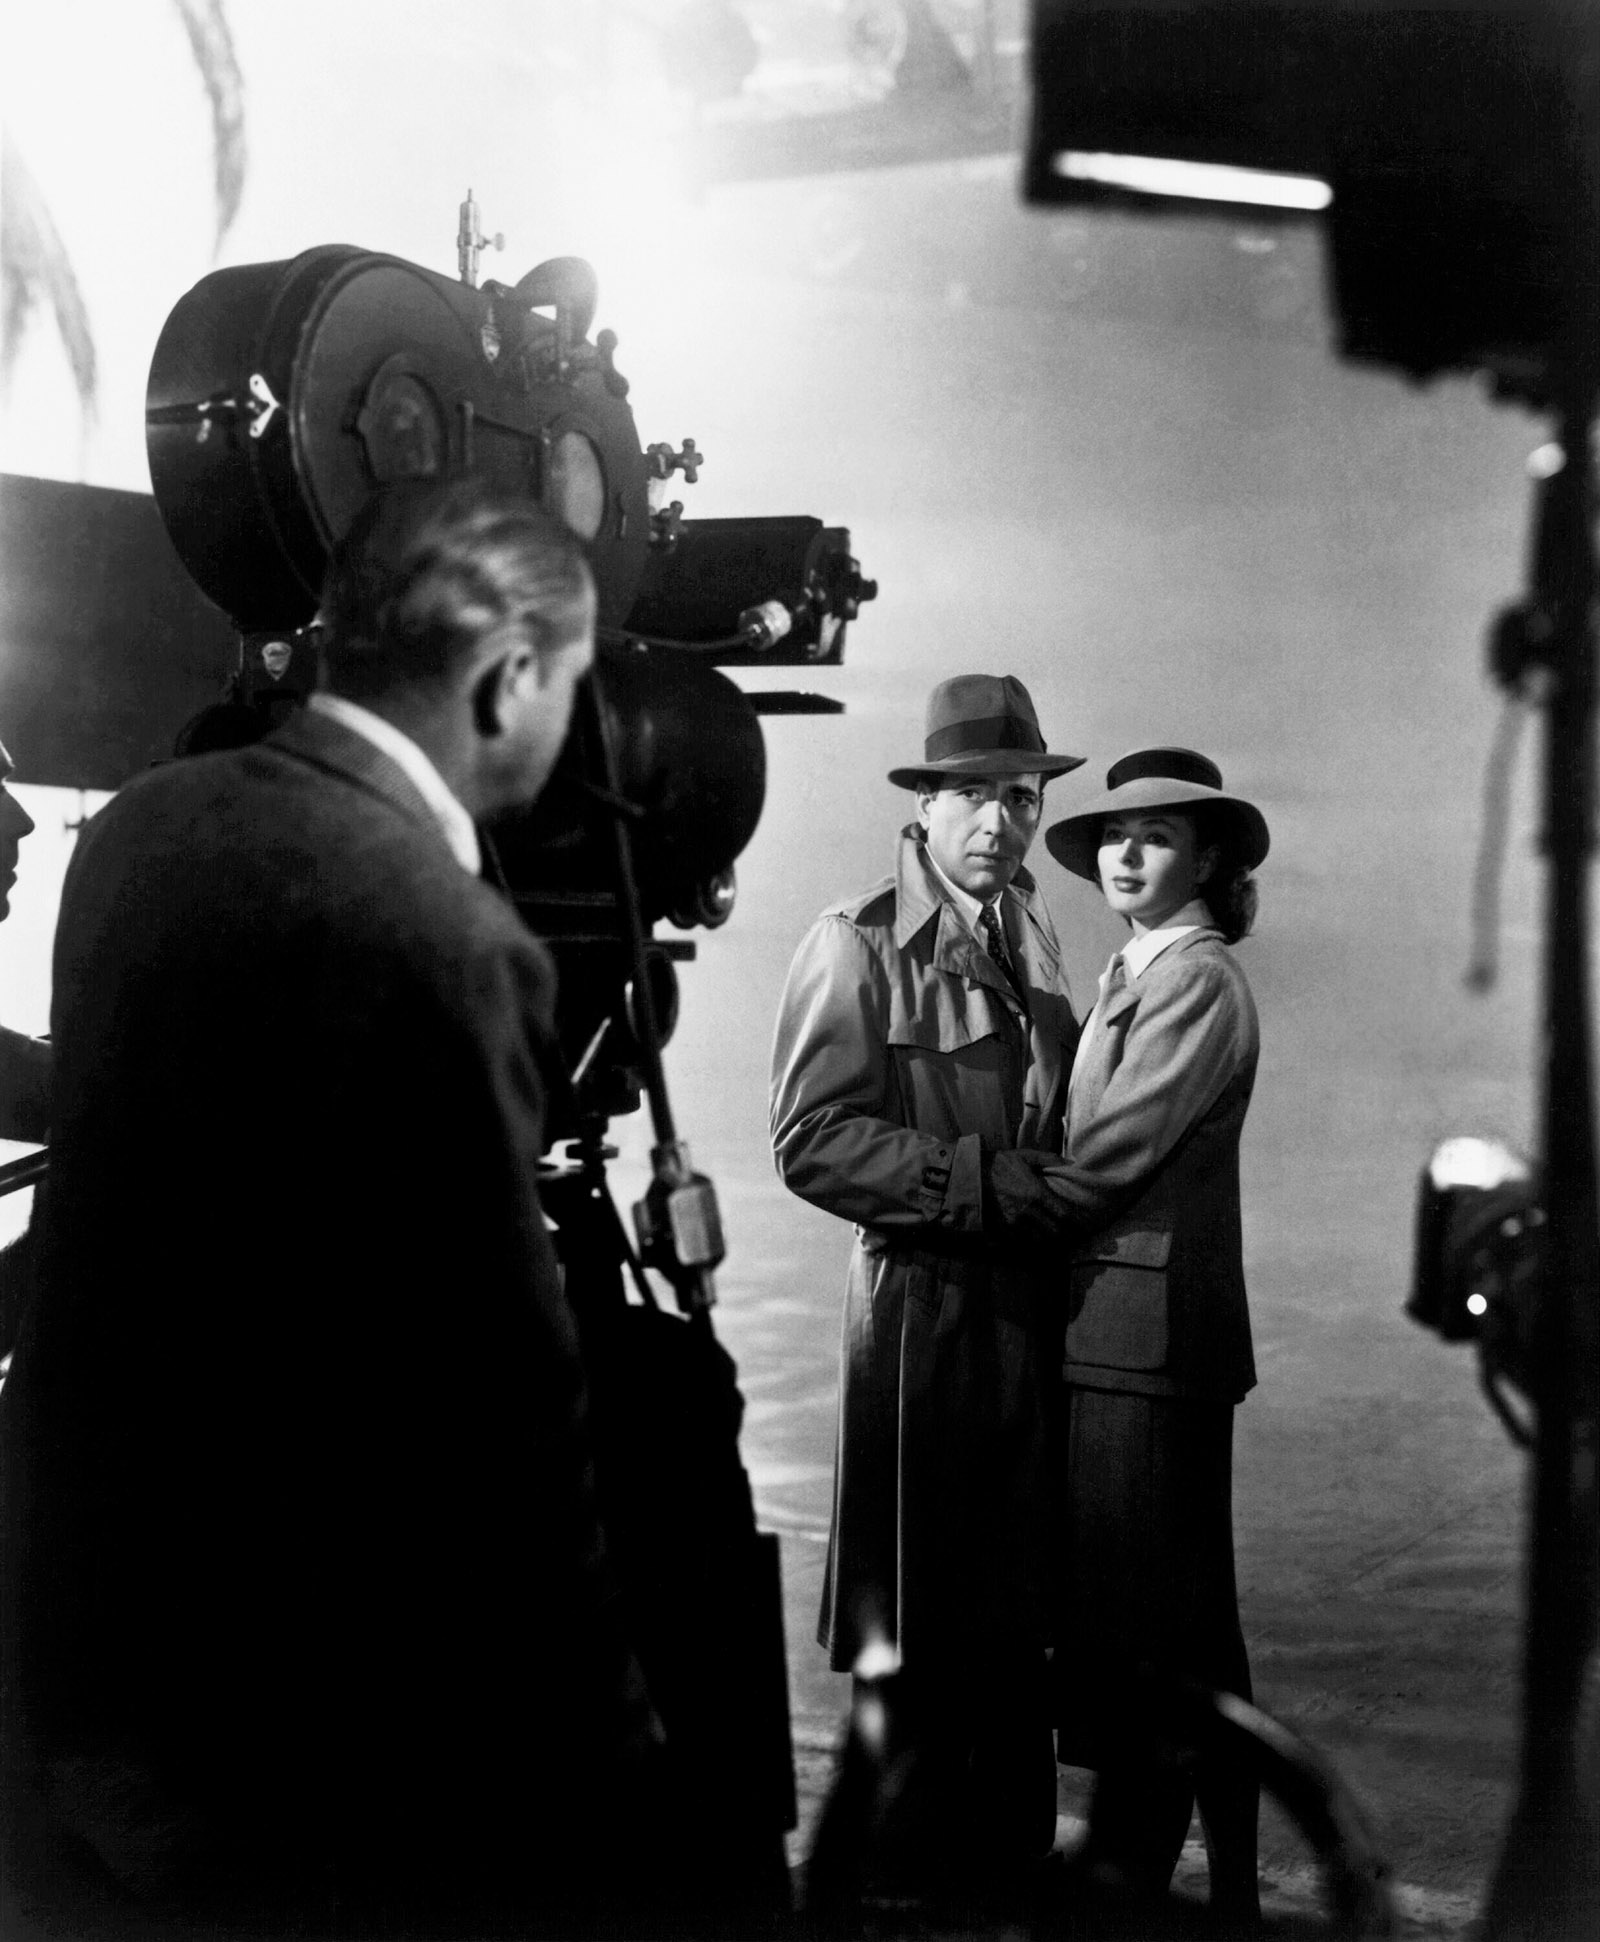 Michael Curtiz directing Humphrey Bogart and Ingrid Bergman on the set of Casablanca, 1942